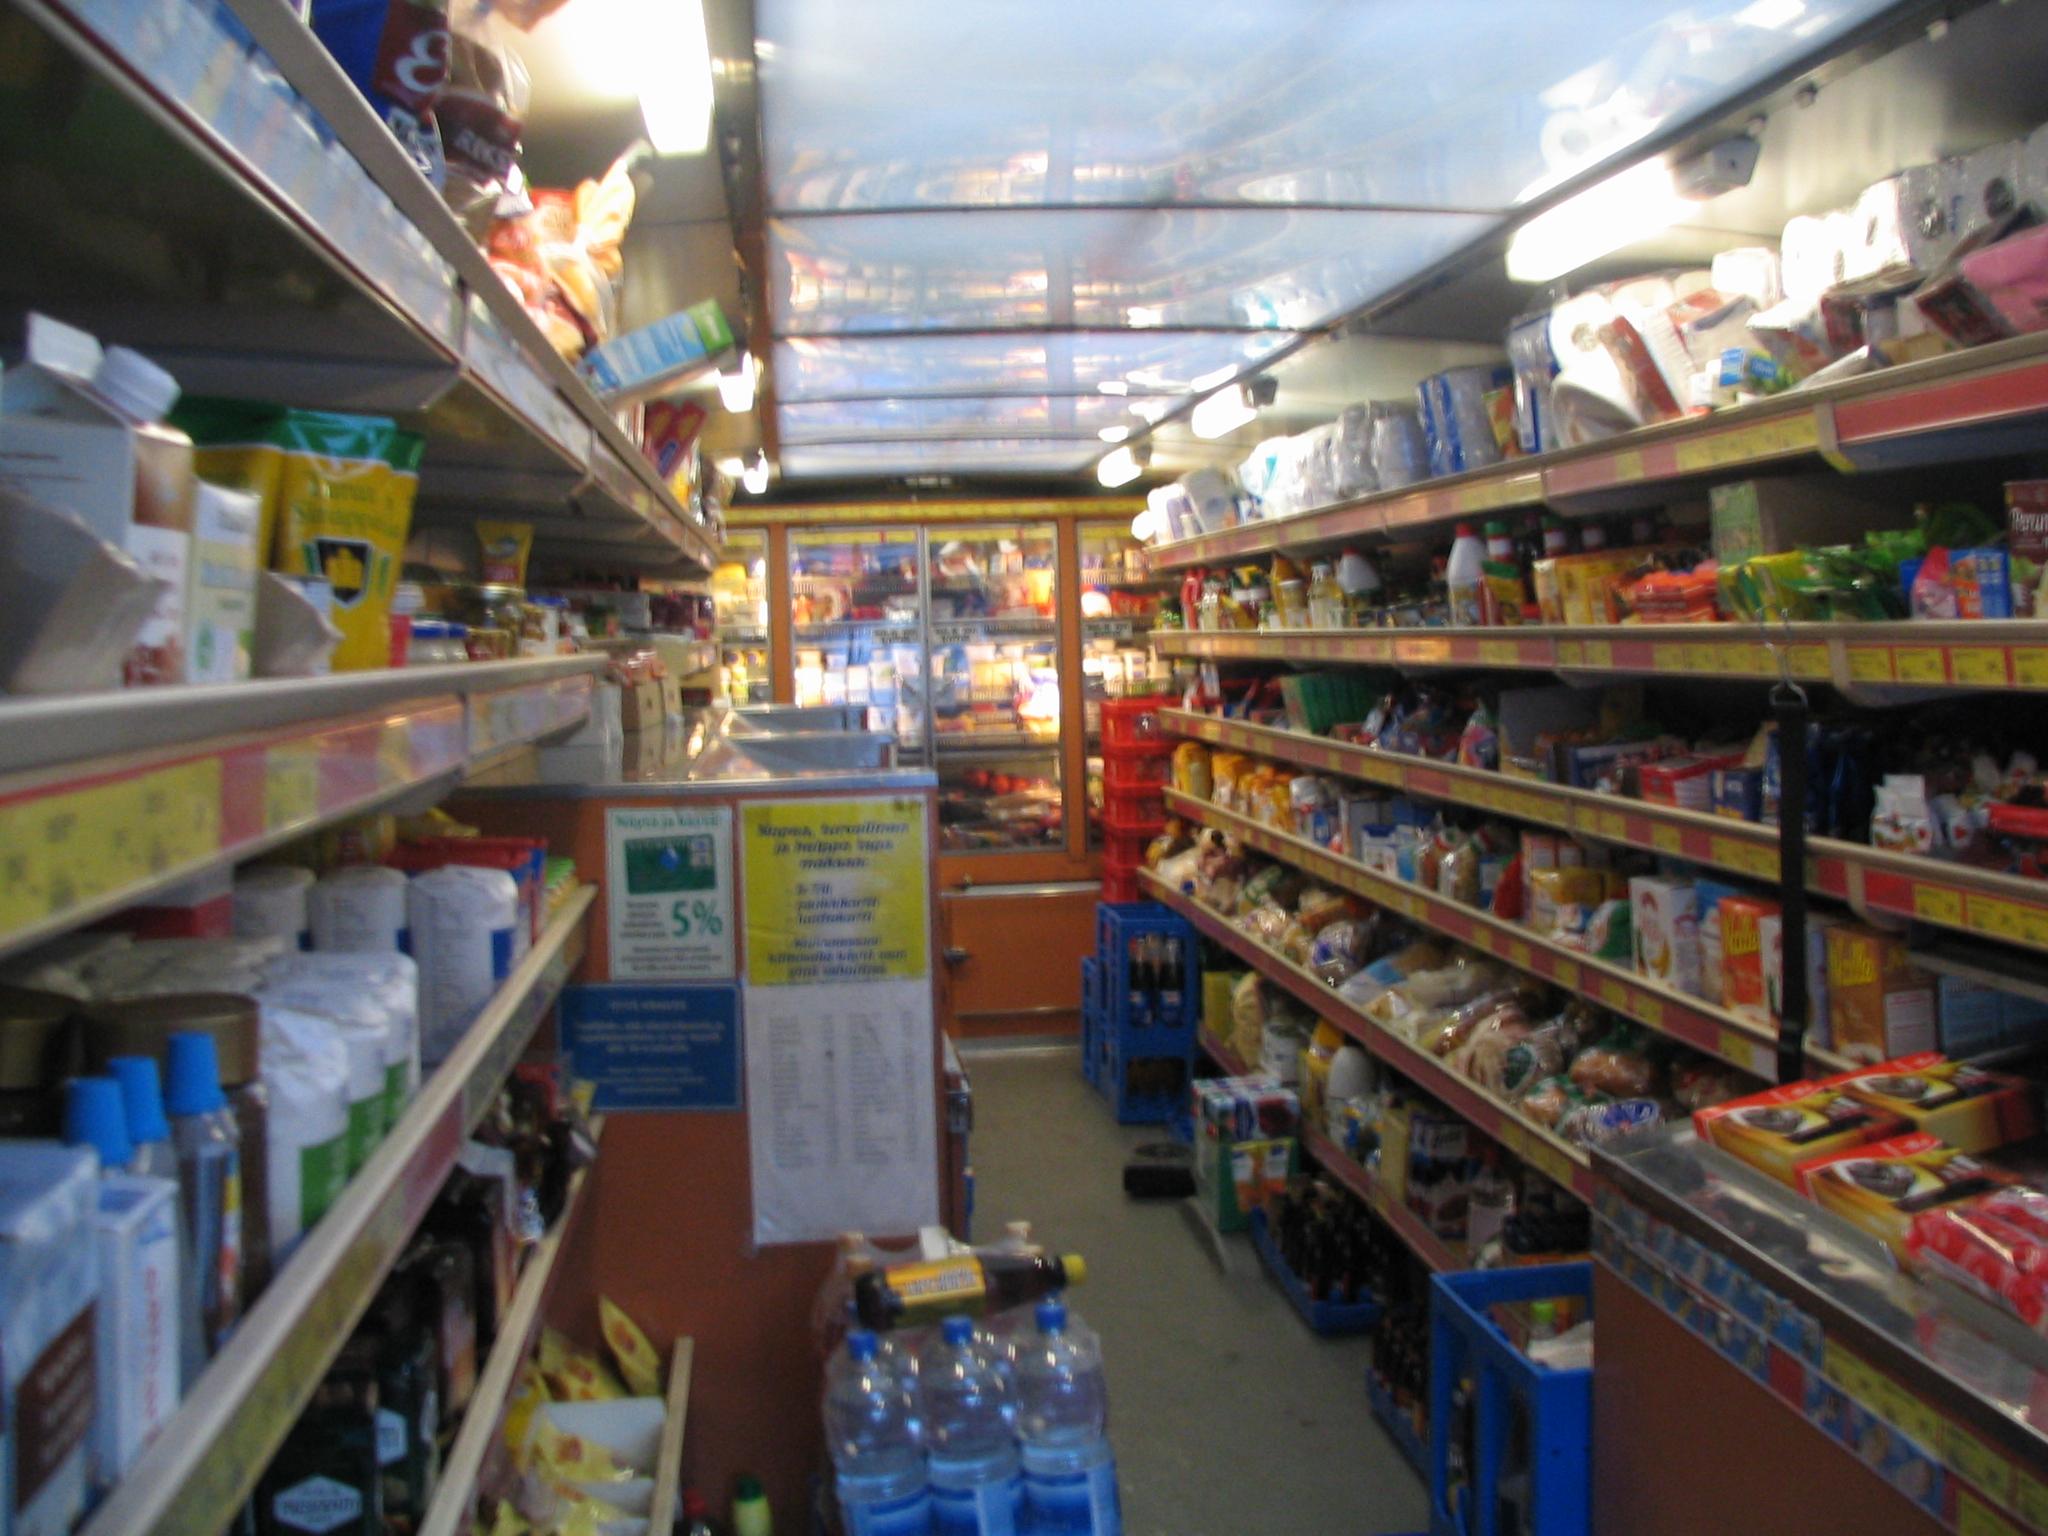 Inside Grocery Store